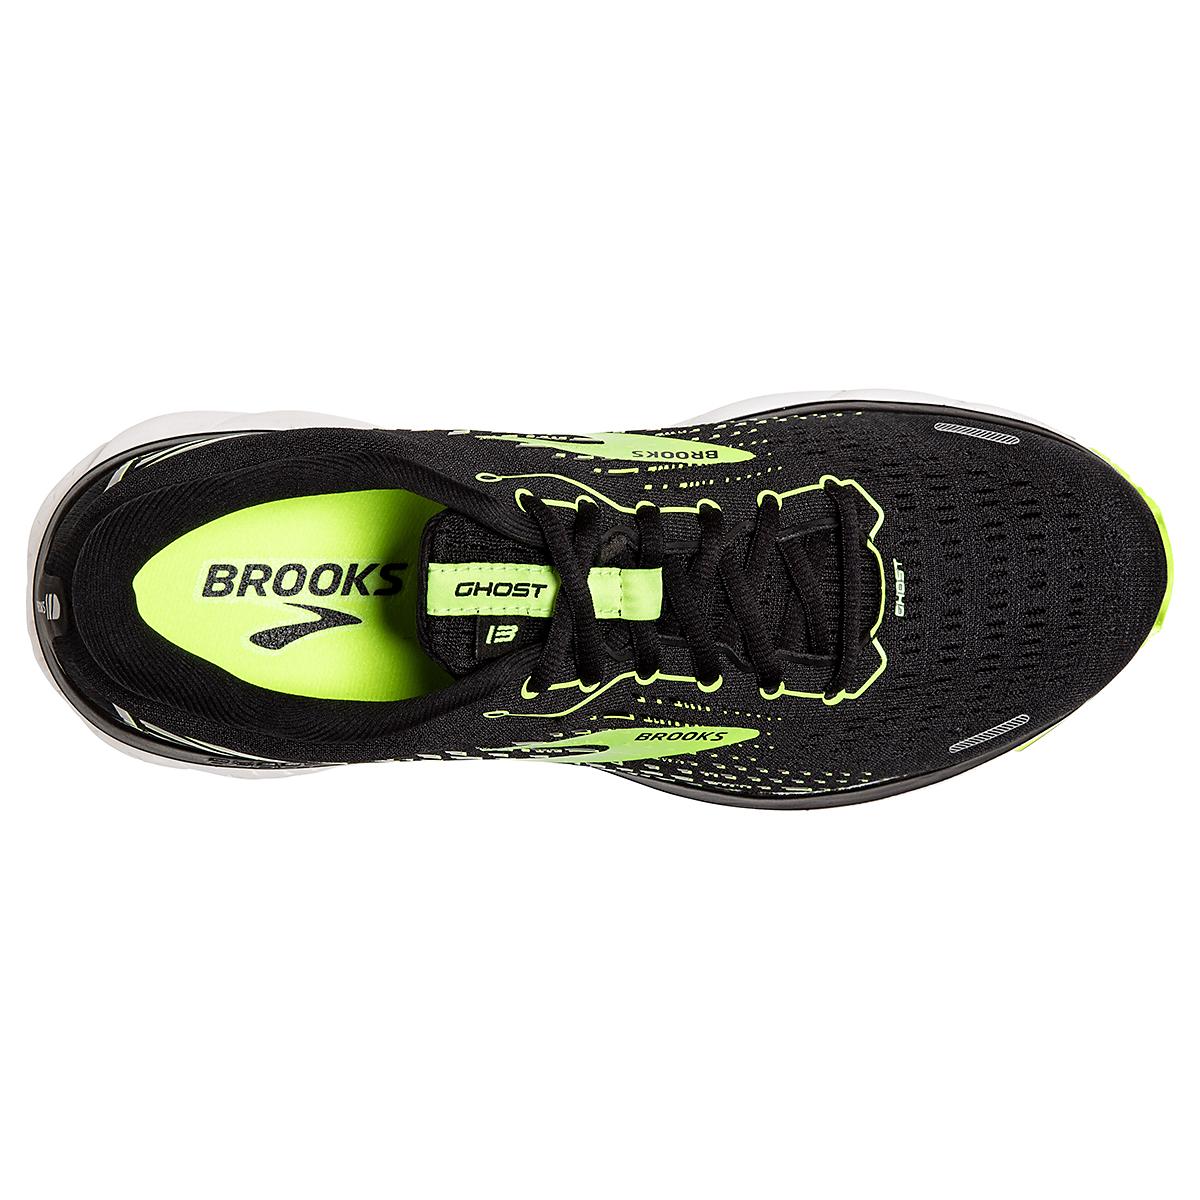 Men's Brooks Ghost 13 Running Shoe - Color: Black/Nightlife/White - Size: 7 - Width: Regular, Black/Nightlife/White, large, image 3